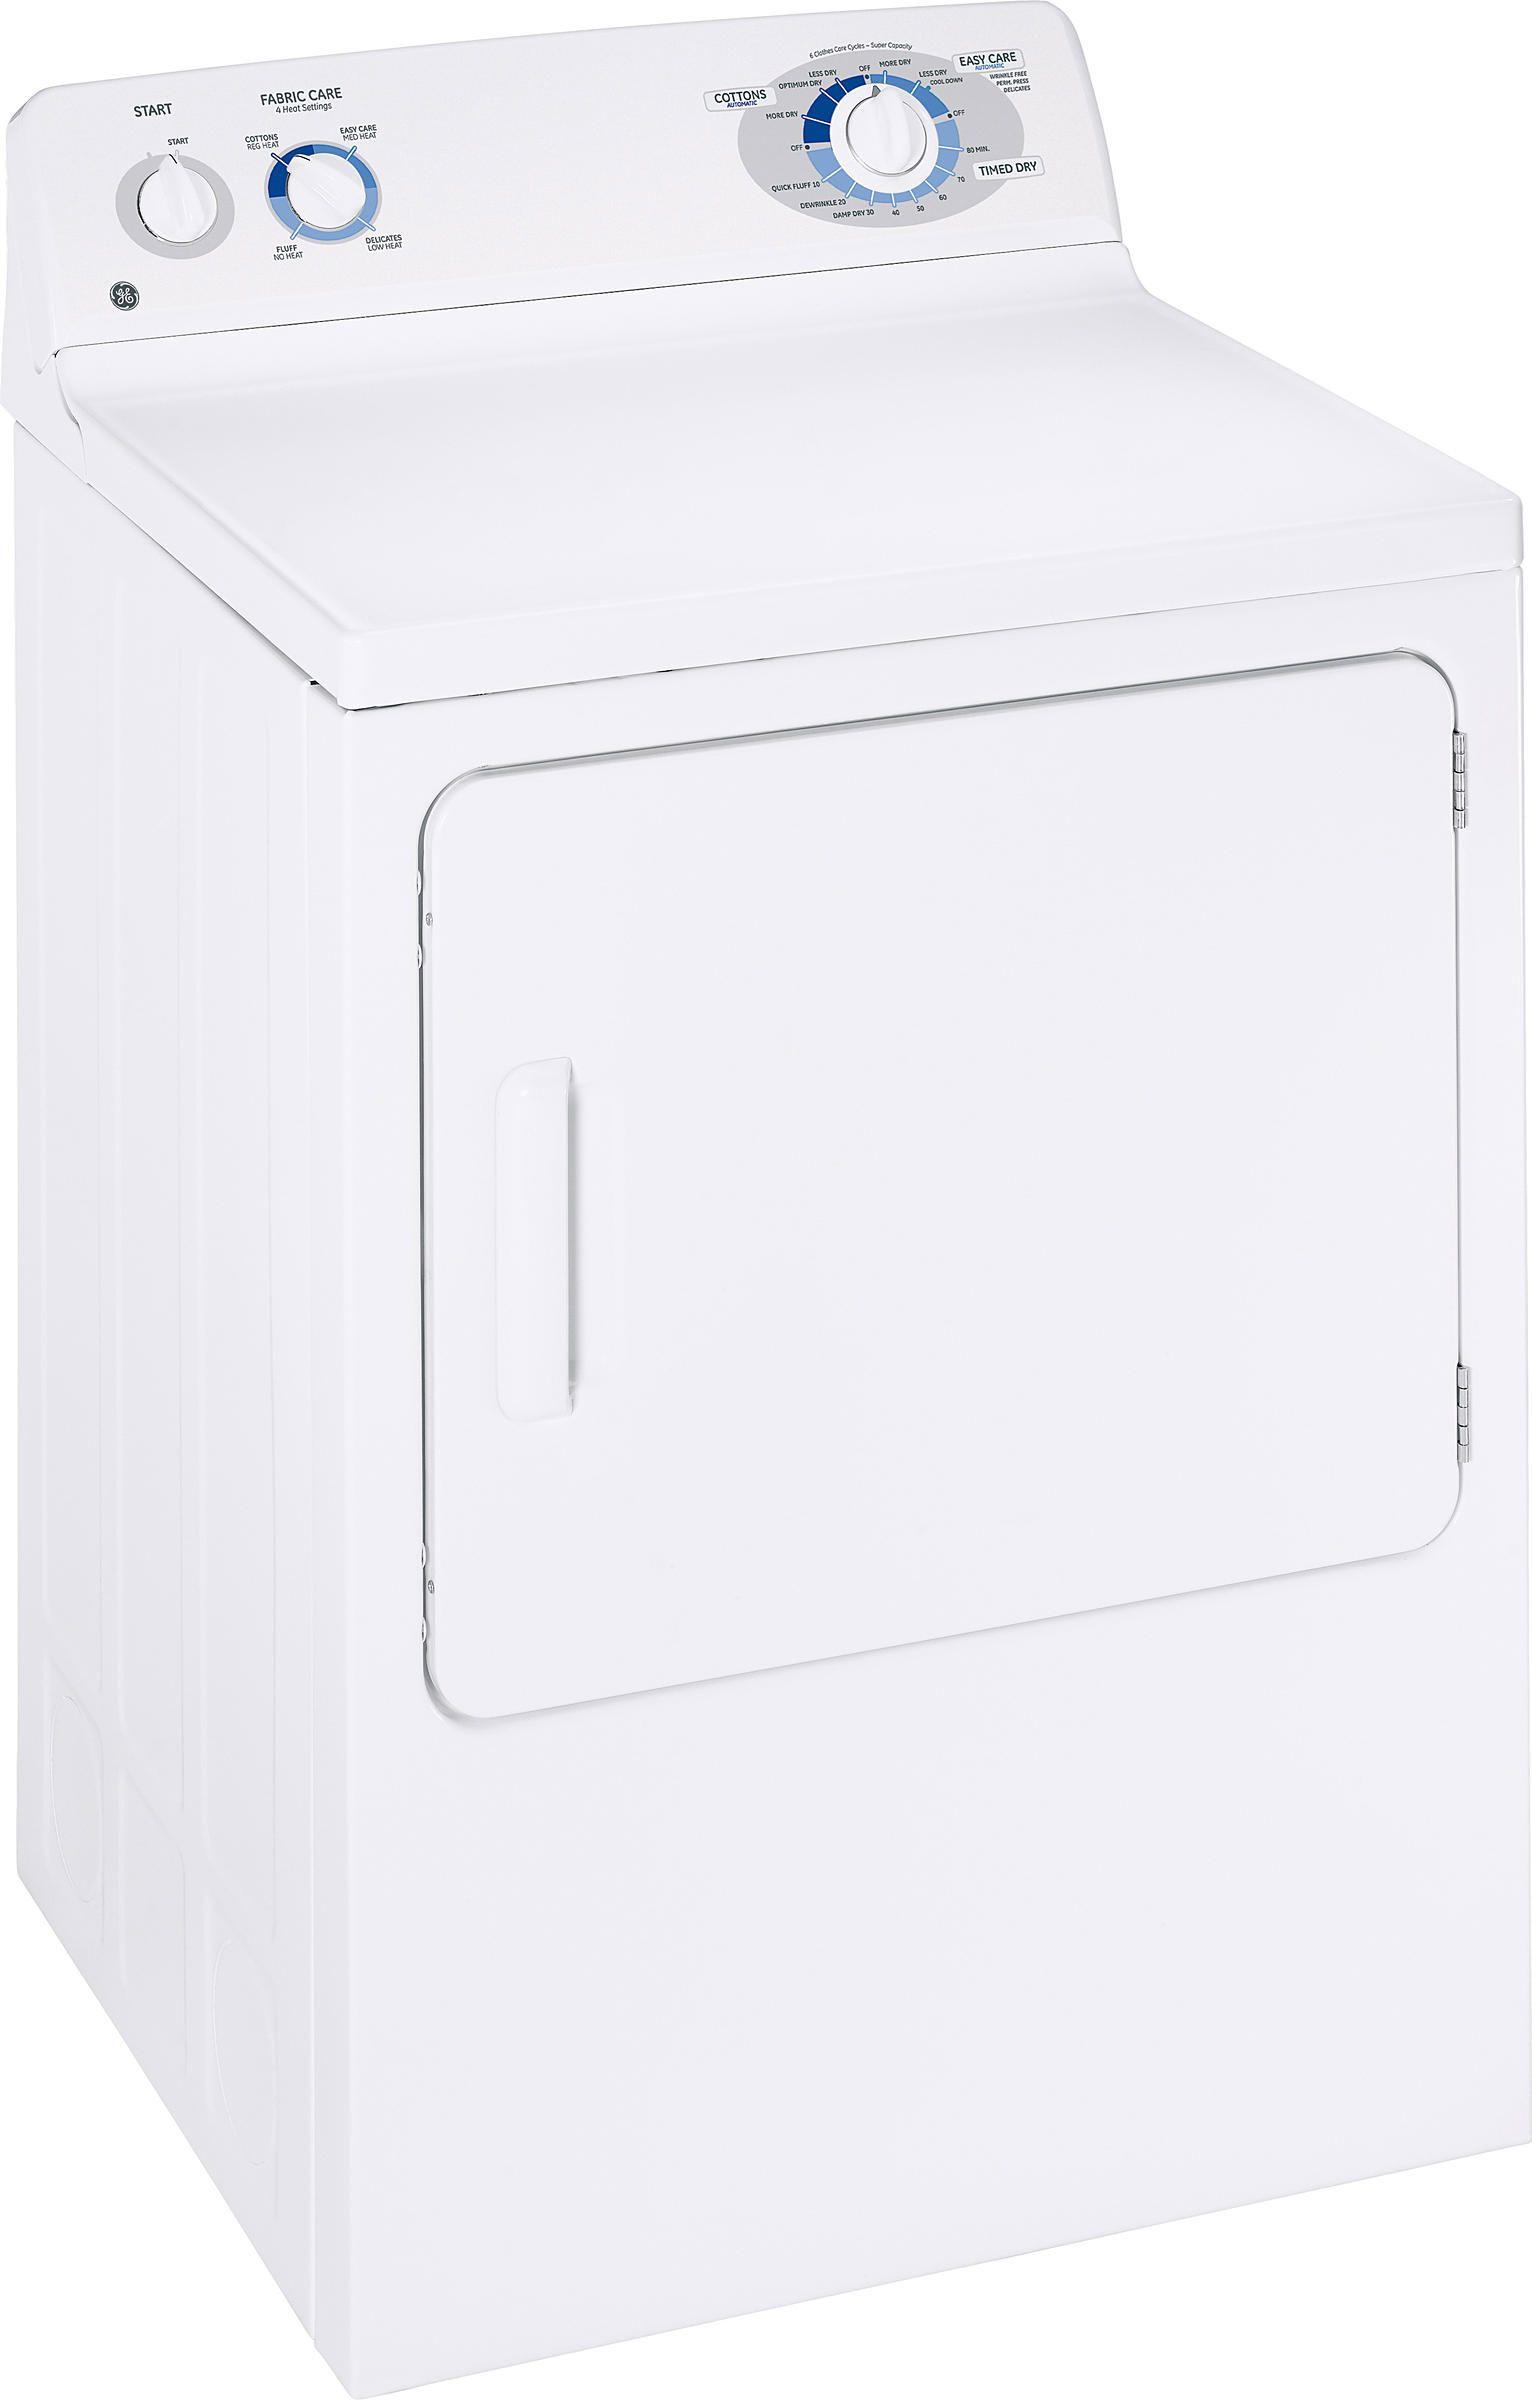 hight resolution of ge model dbxr463eg1ww residential dryer genuine parts rh searspartsdirect com ge dryer repair manual ge front